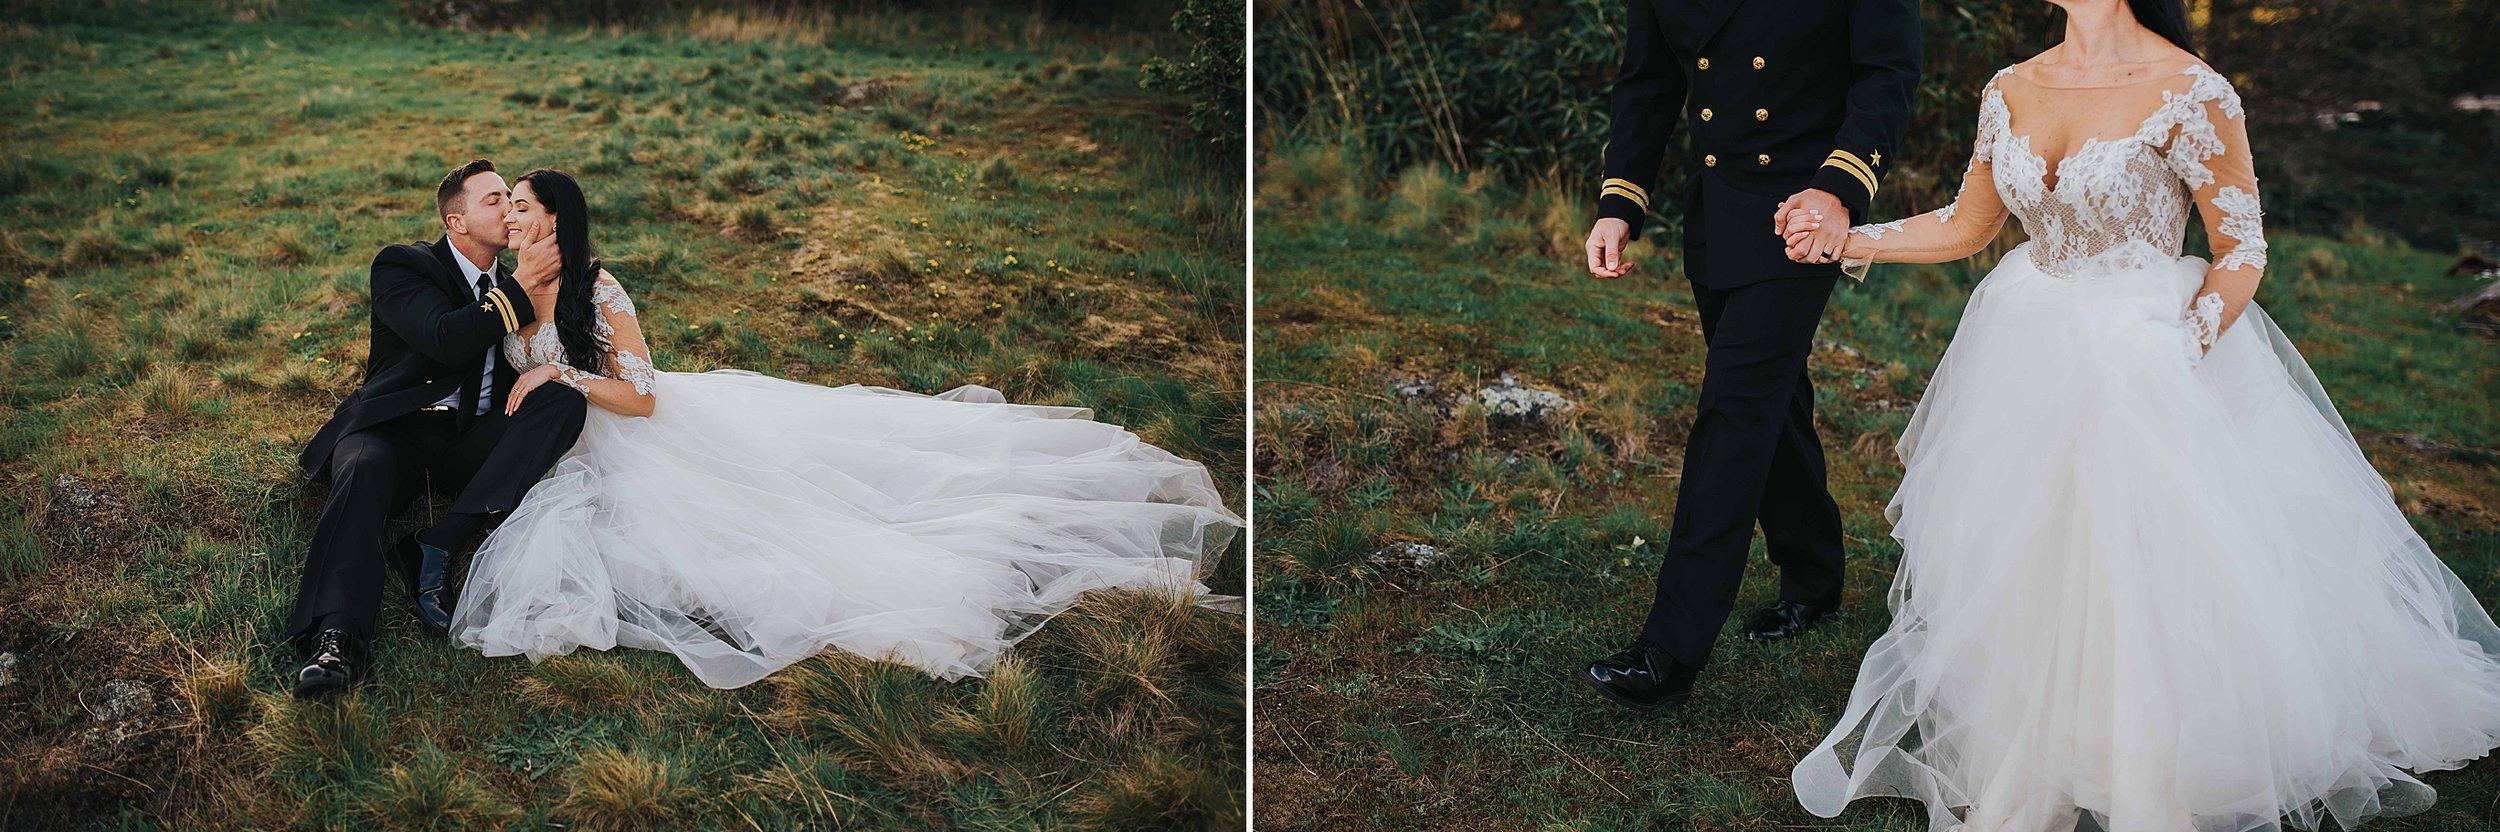 KC-Wedding-photographer-J HODGES PHOTOGRAPHY_0259.jpg